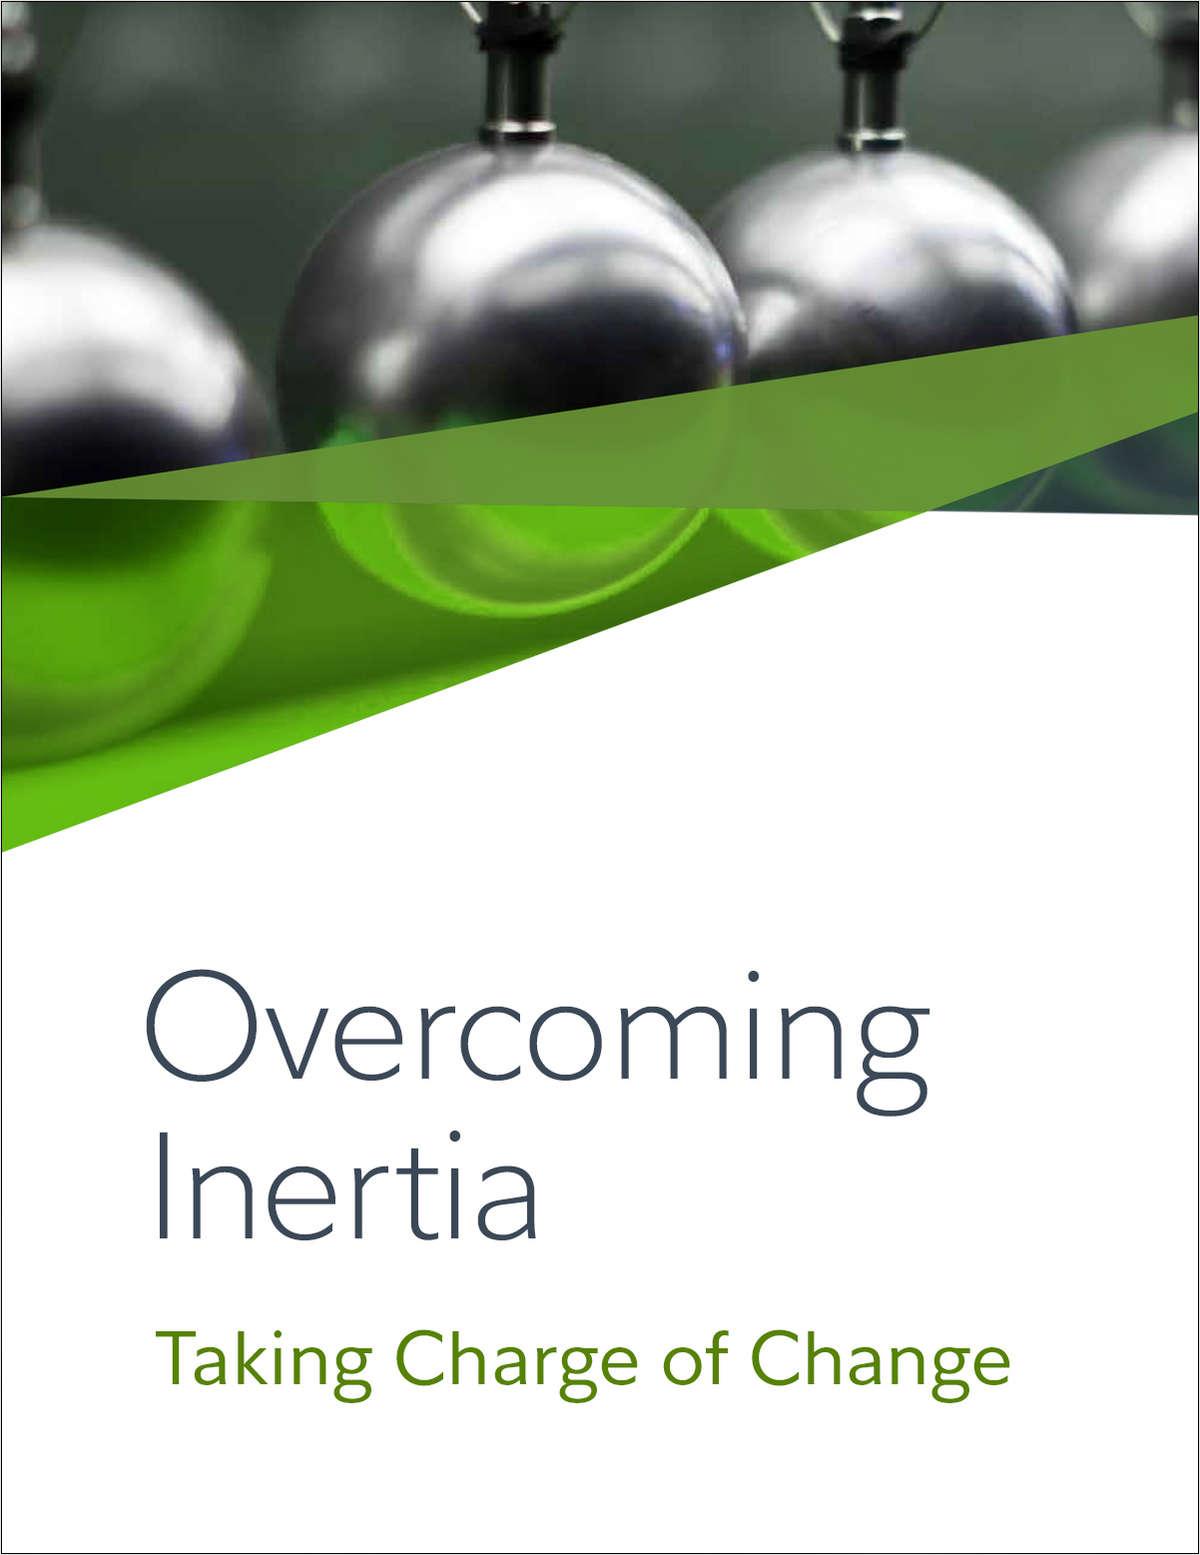 Overcoming Inertia: Taking Charge Of Change